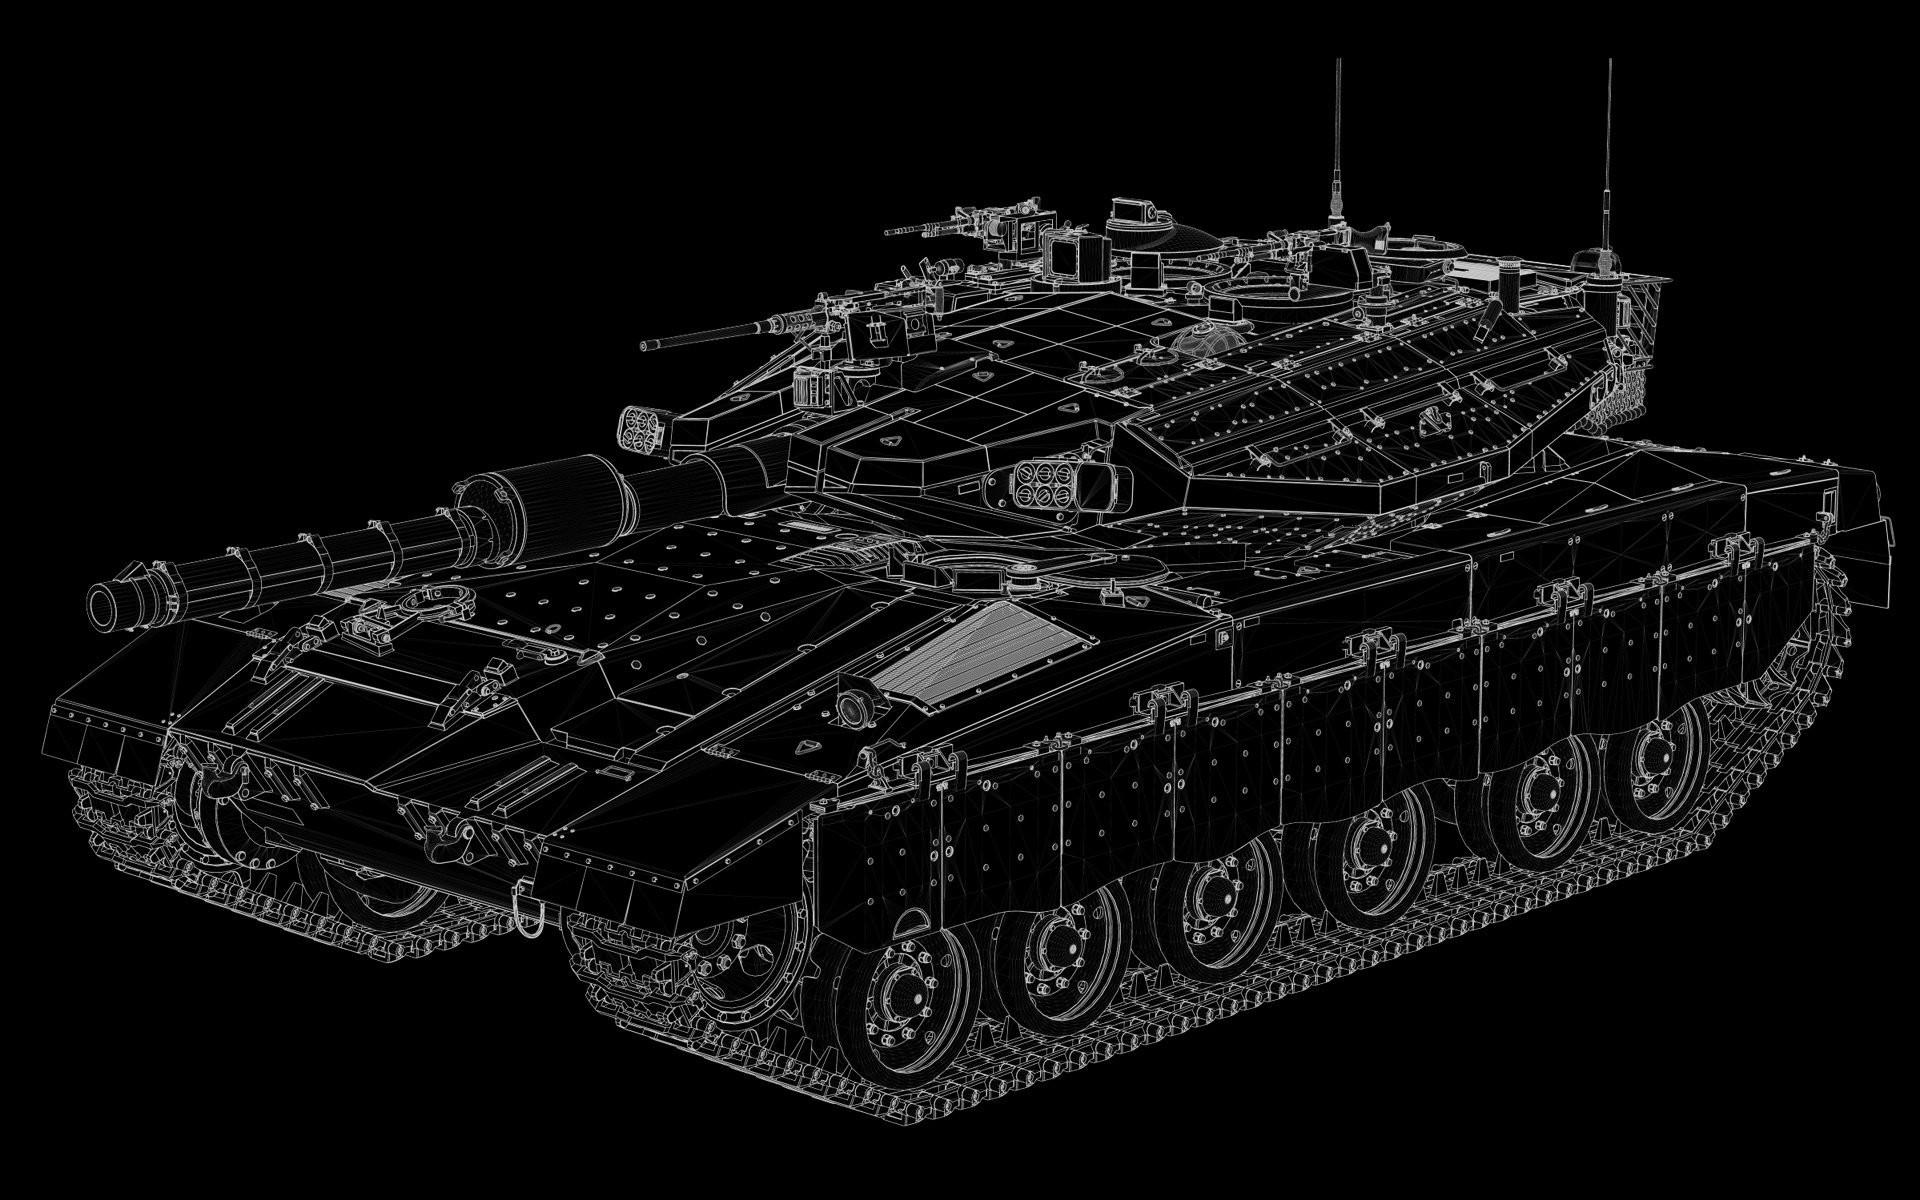 merkava-iiid merkava battle tank background